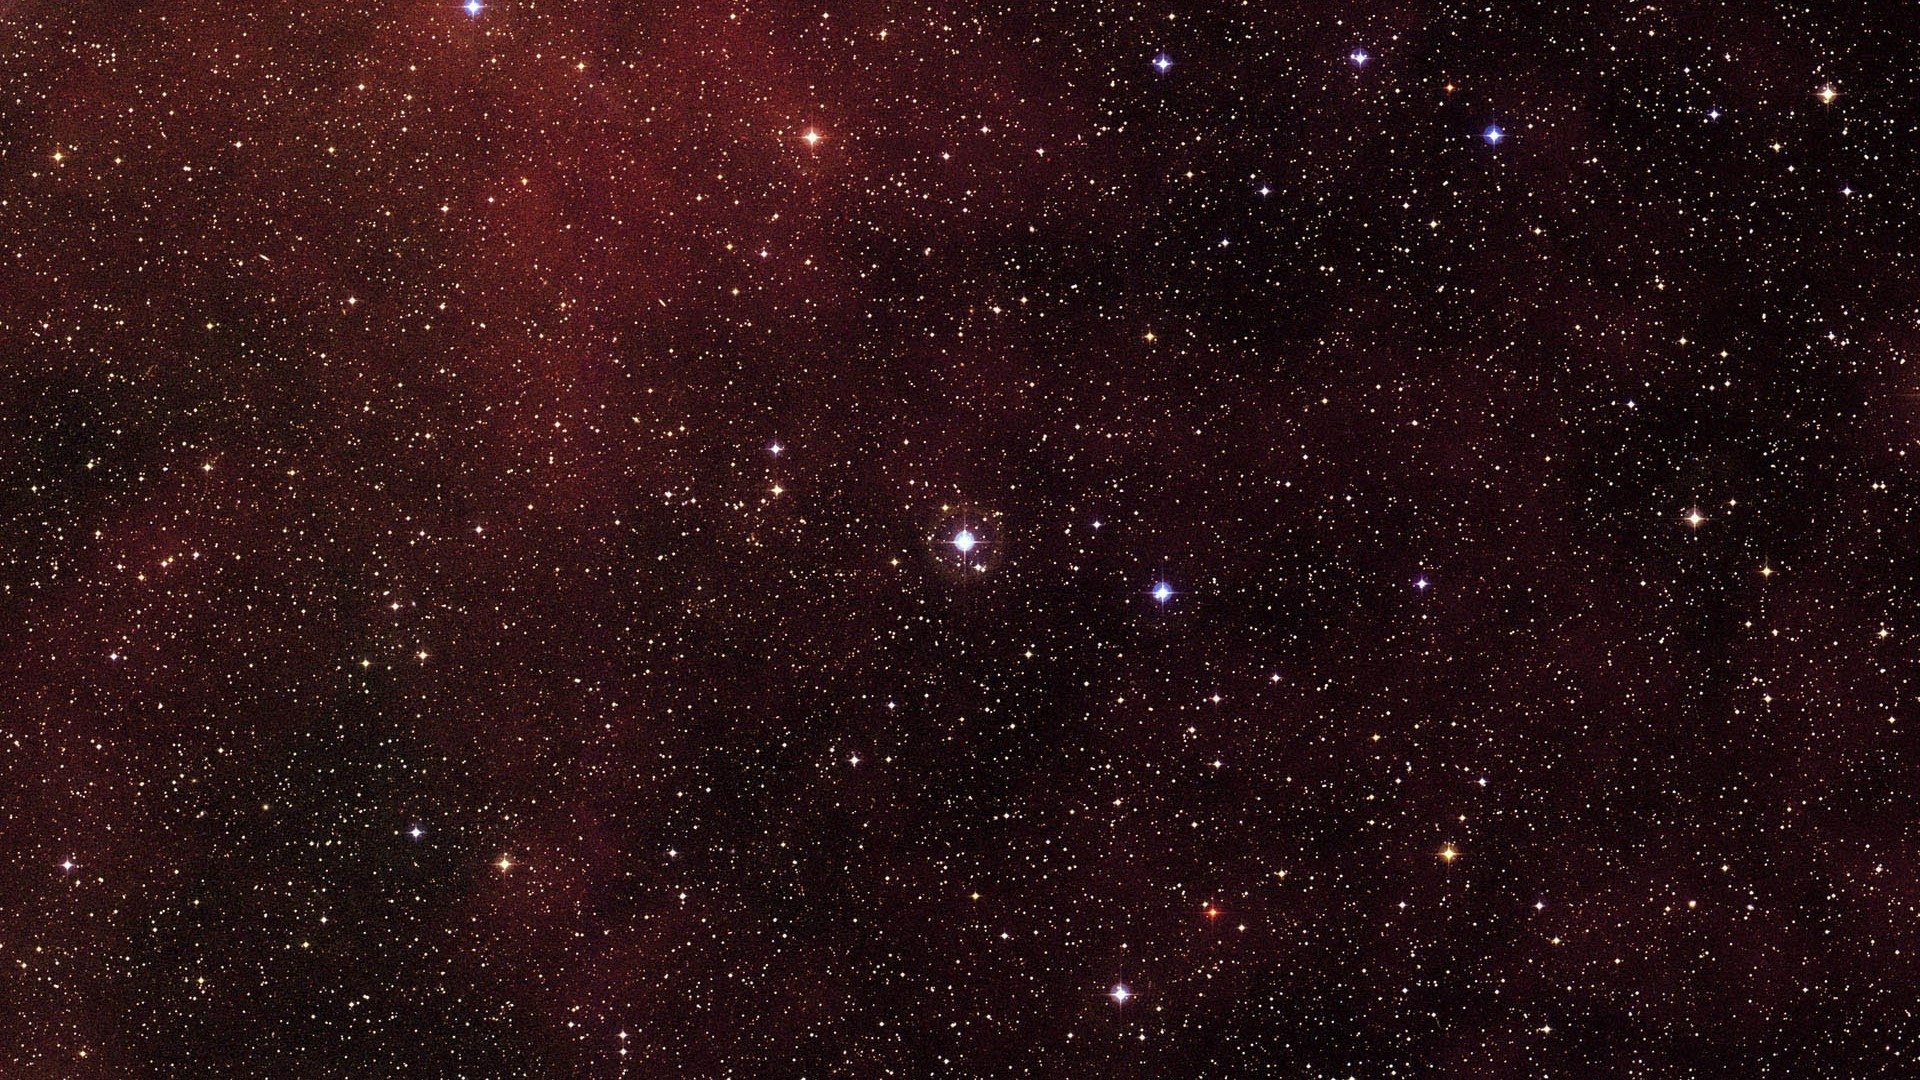 stars wallpapers 1920x1080 - photo #8